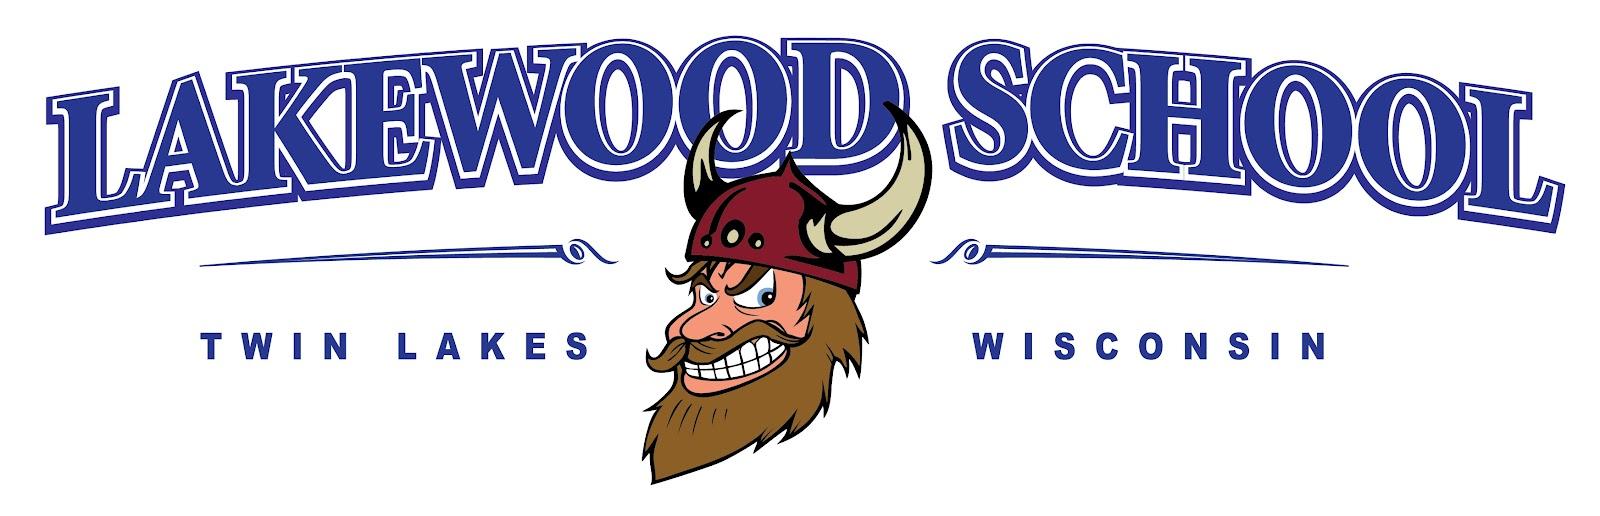 Lakewood_Blue Logo Banner_Color.JPG